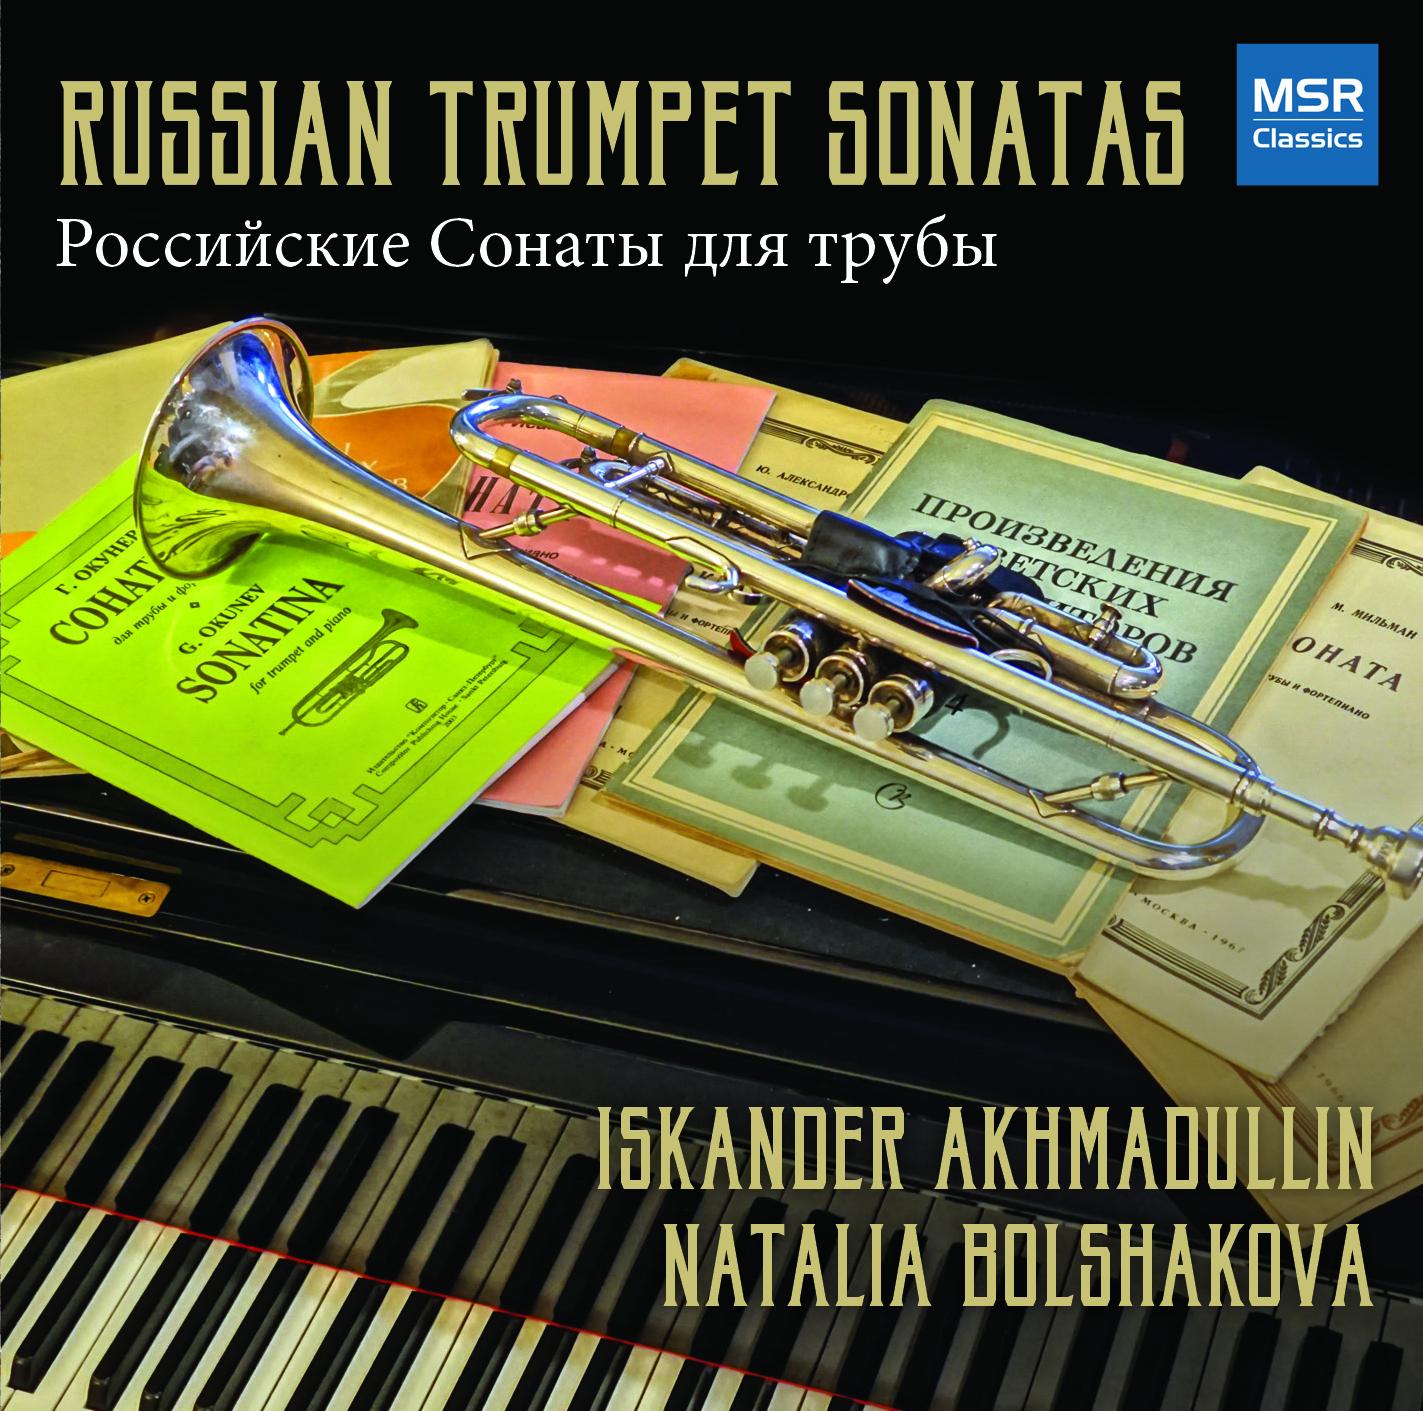 Russian Trumpet Sonatas Akhmadullin